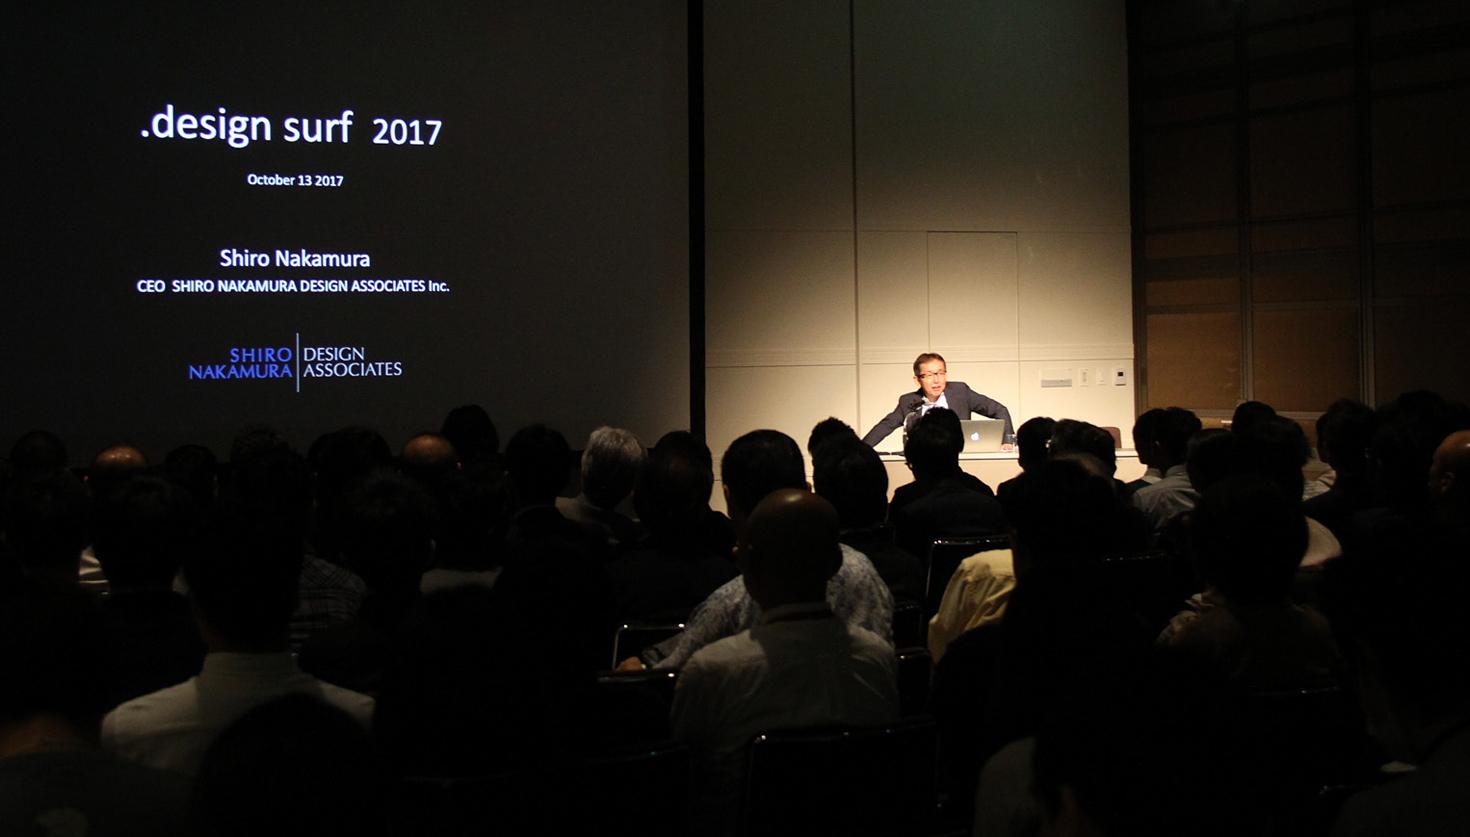 【design surf 2017】日産退任後、初講演  中村史郎氏が振り返る43年のデザイナー人生